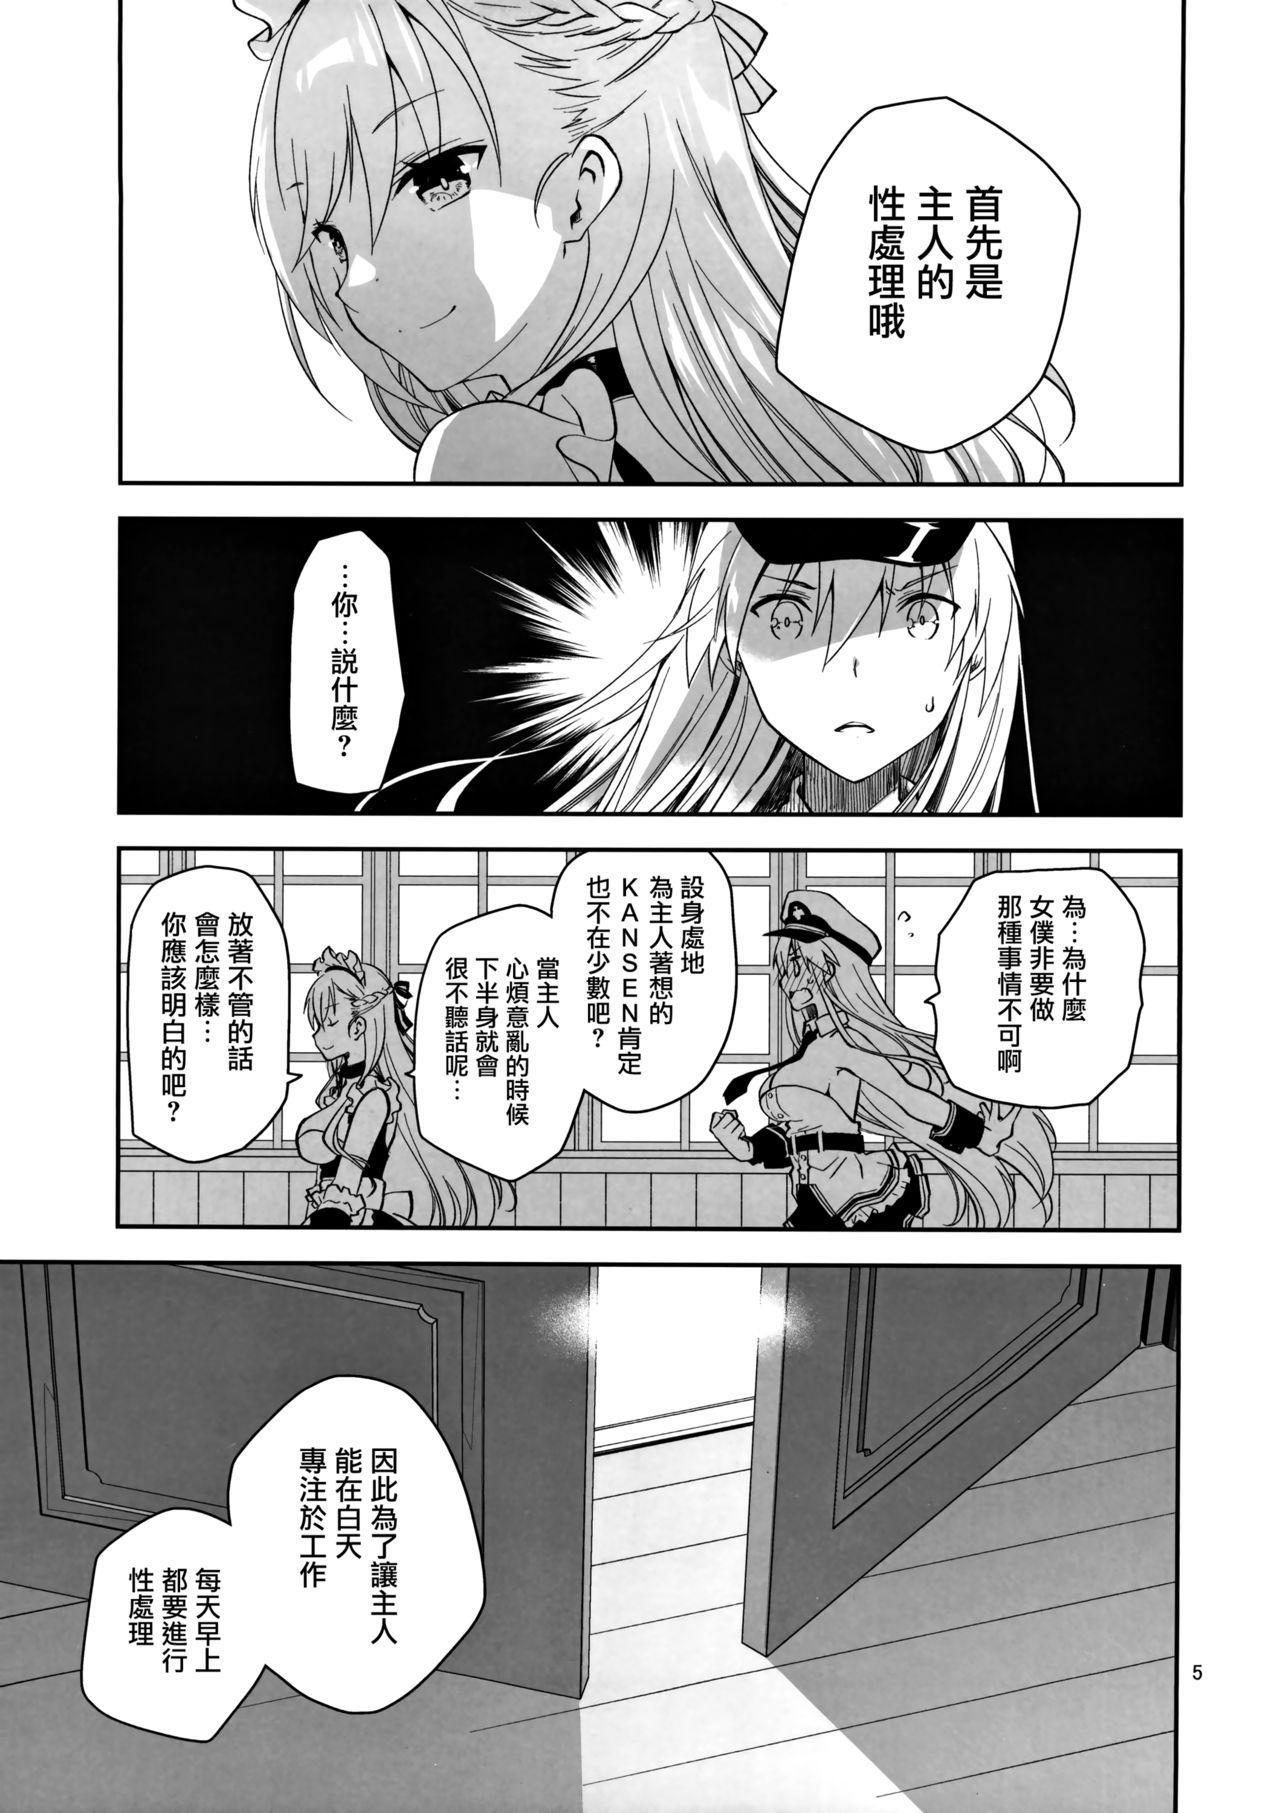 Maid in Enterprise 4